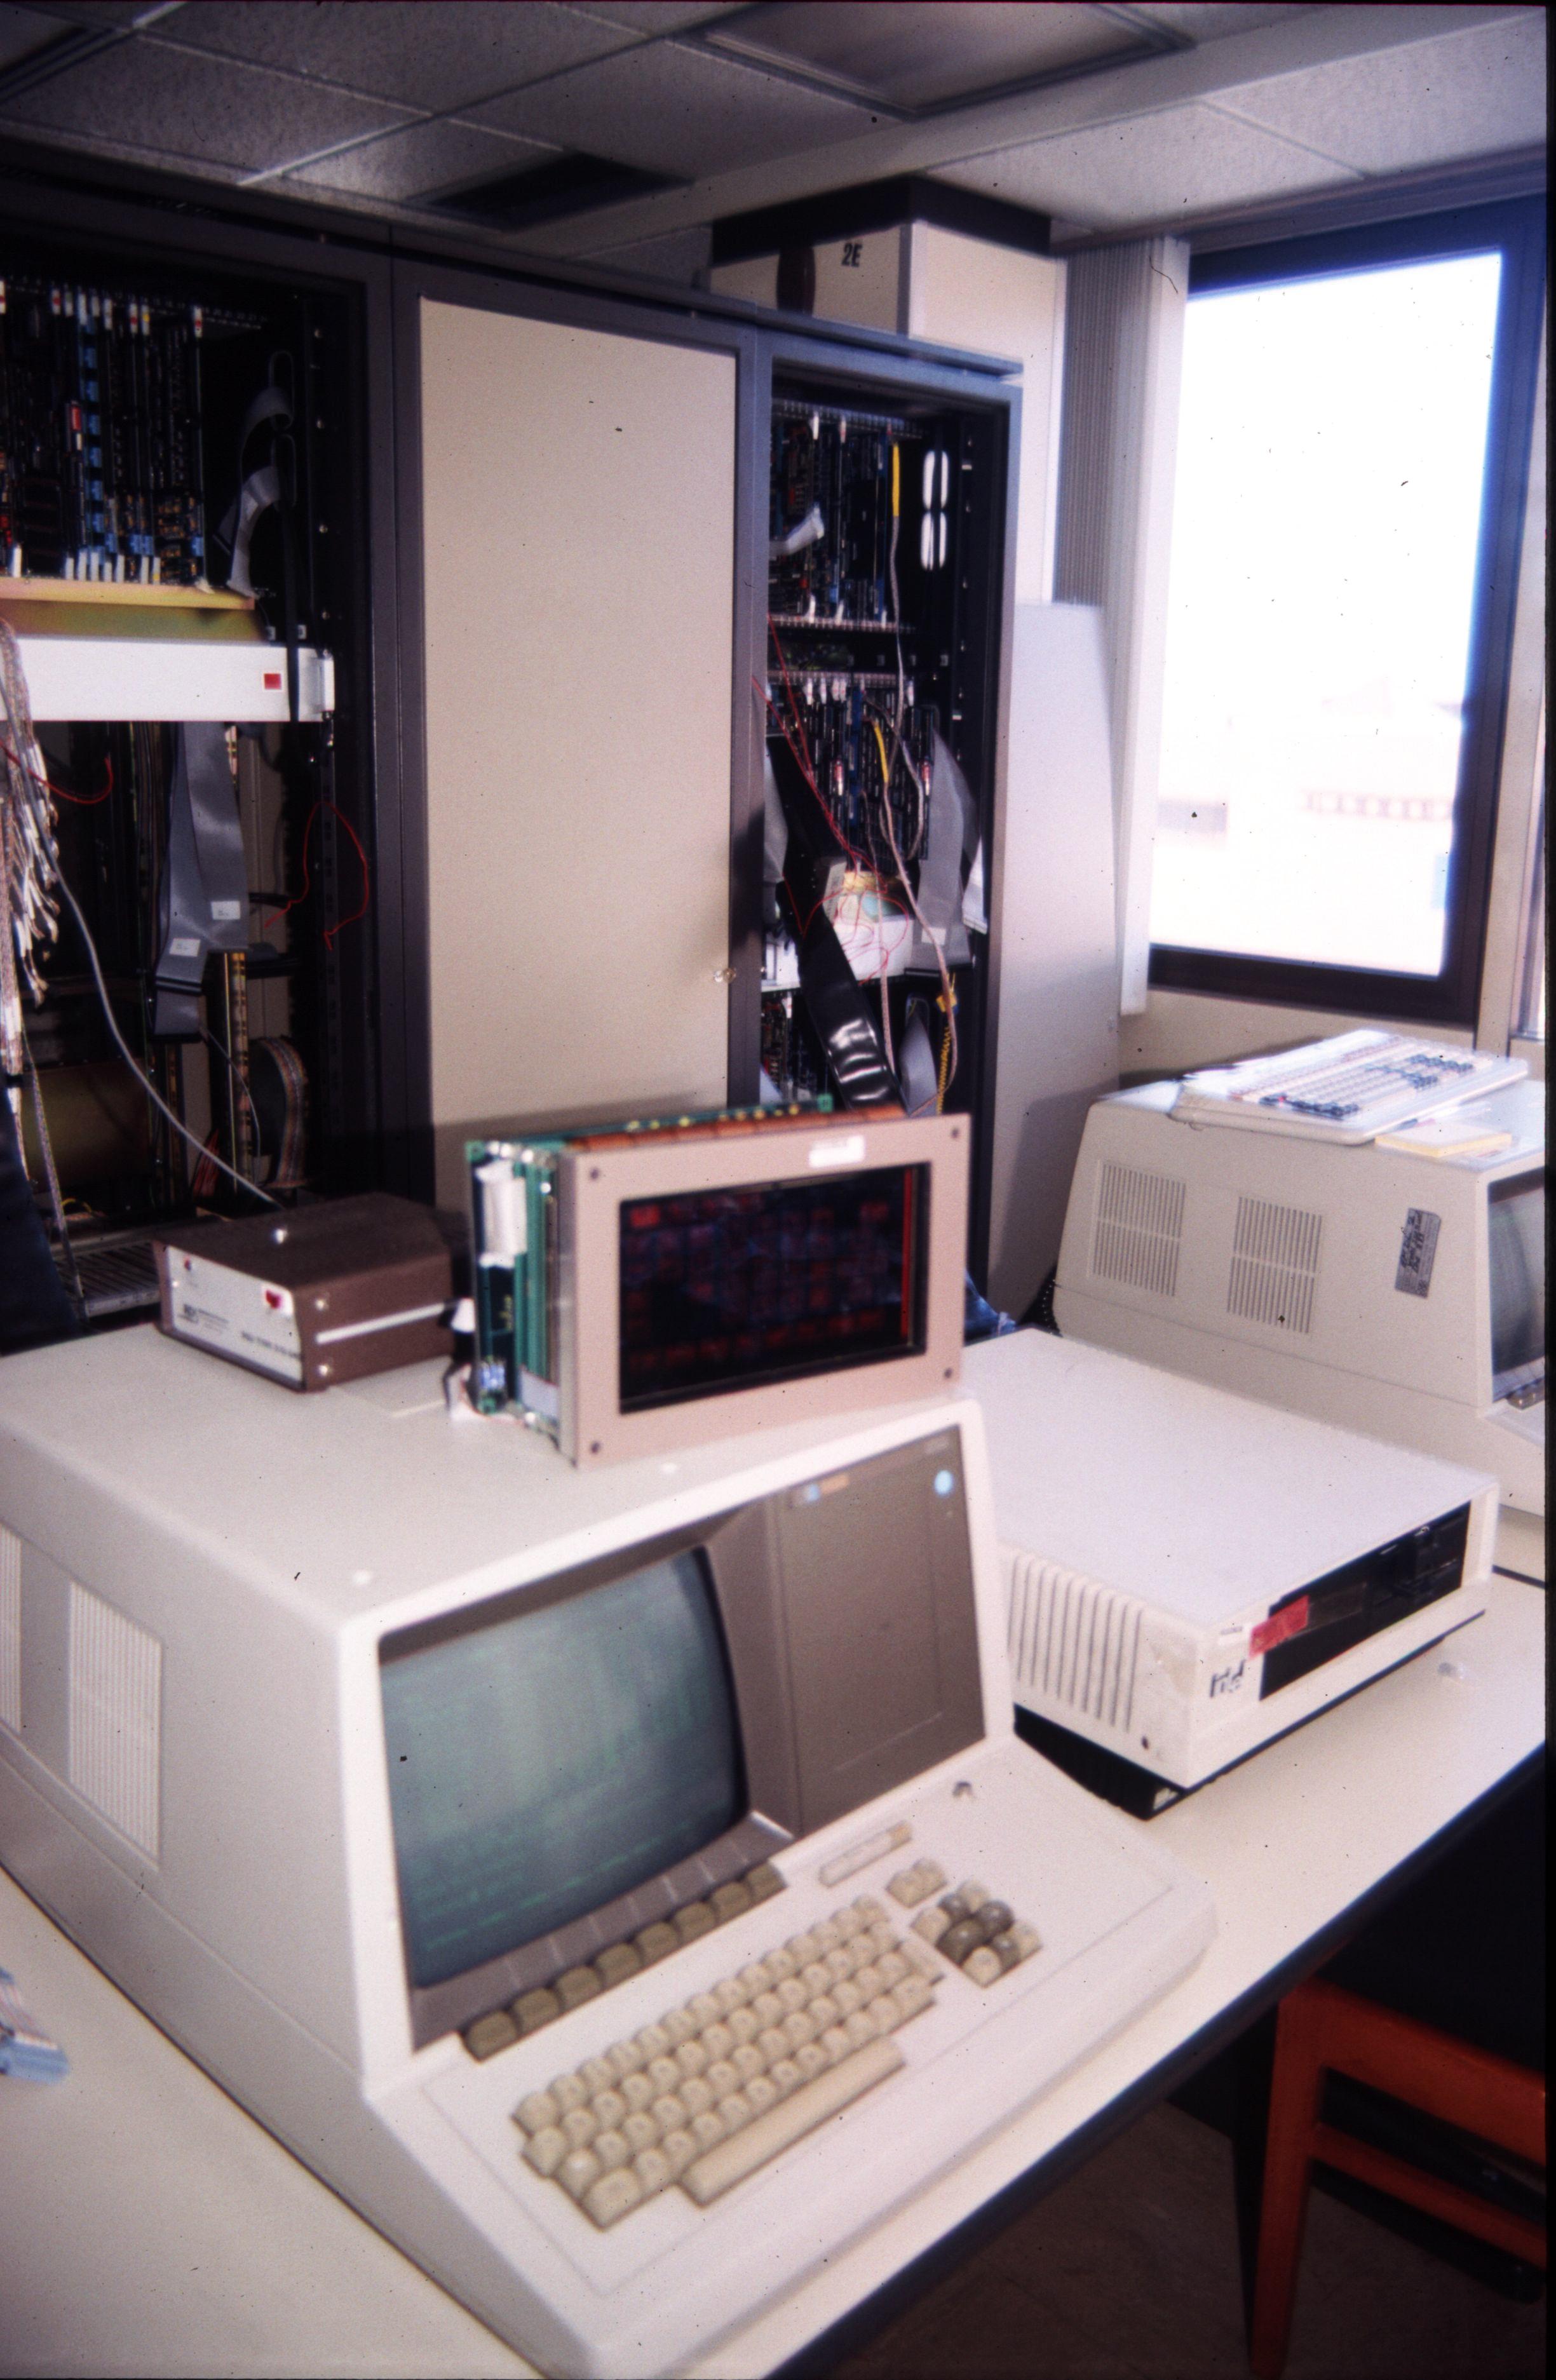 HP 64000 - Wikipedia